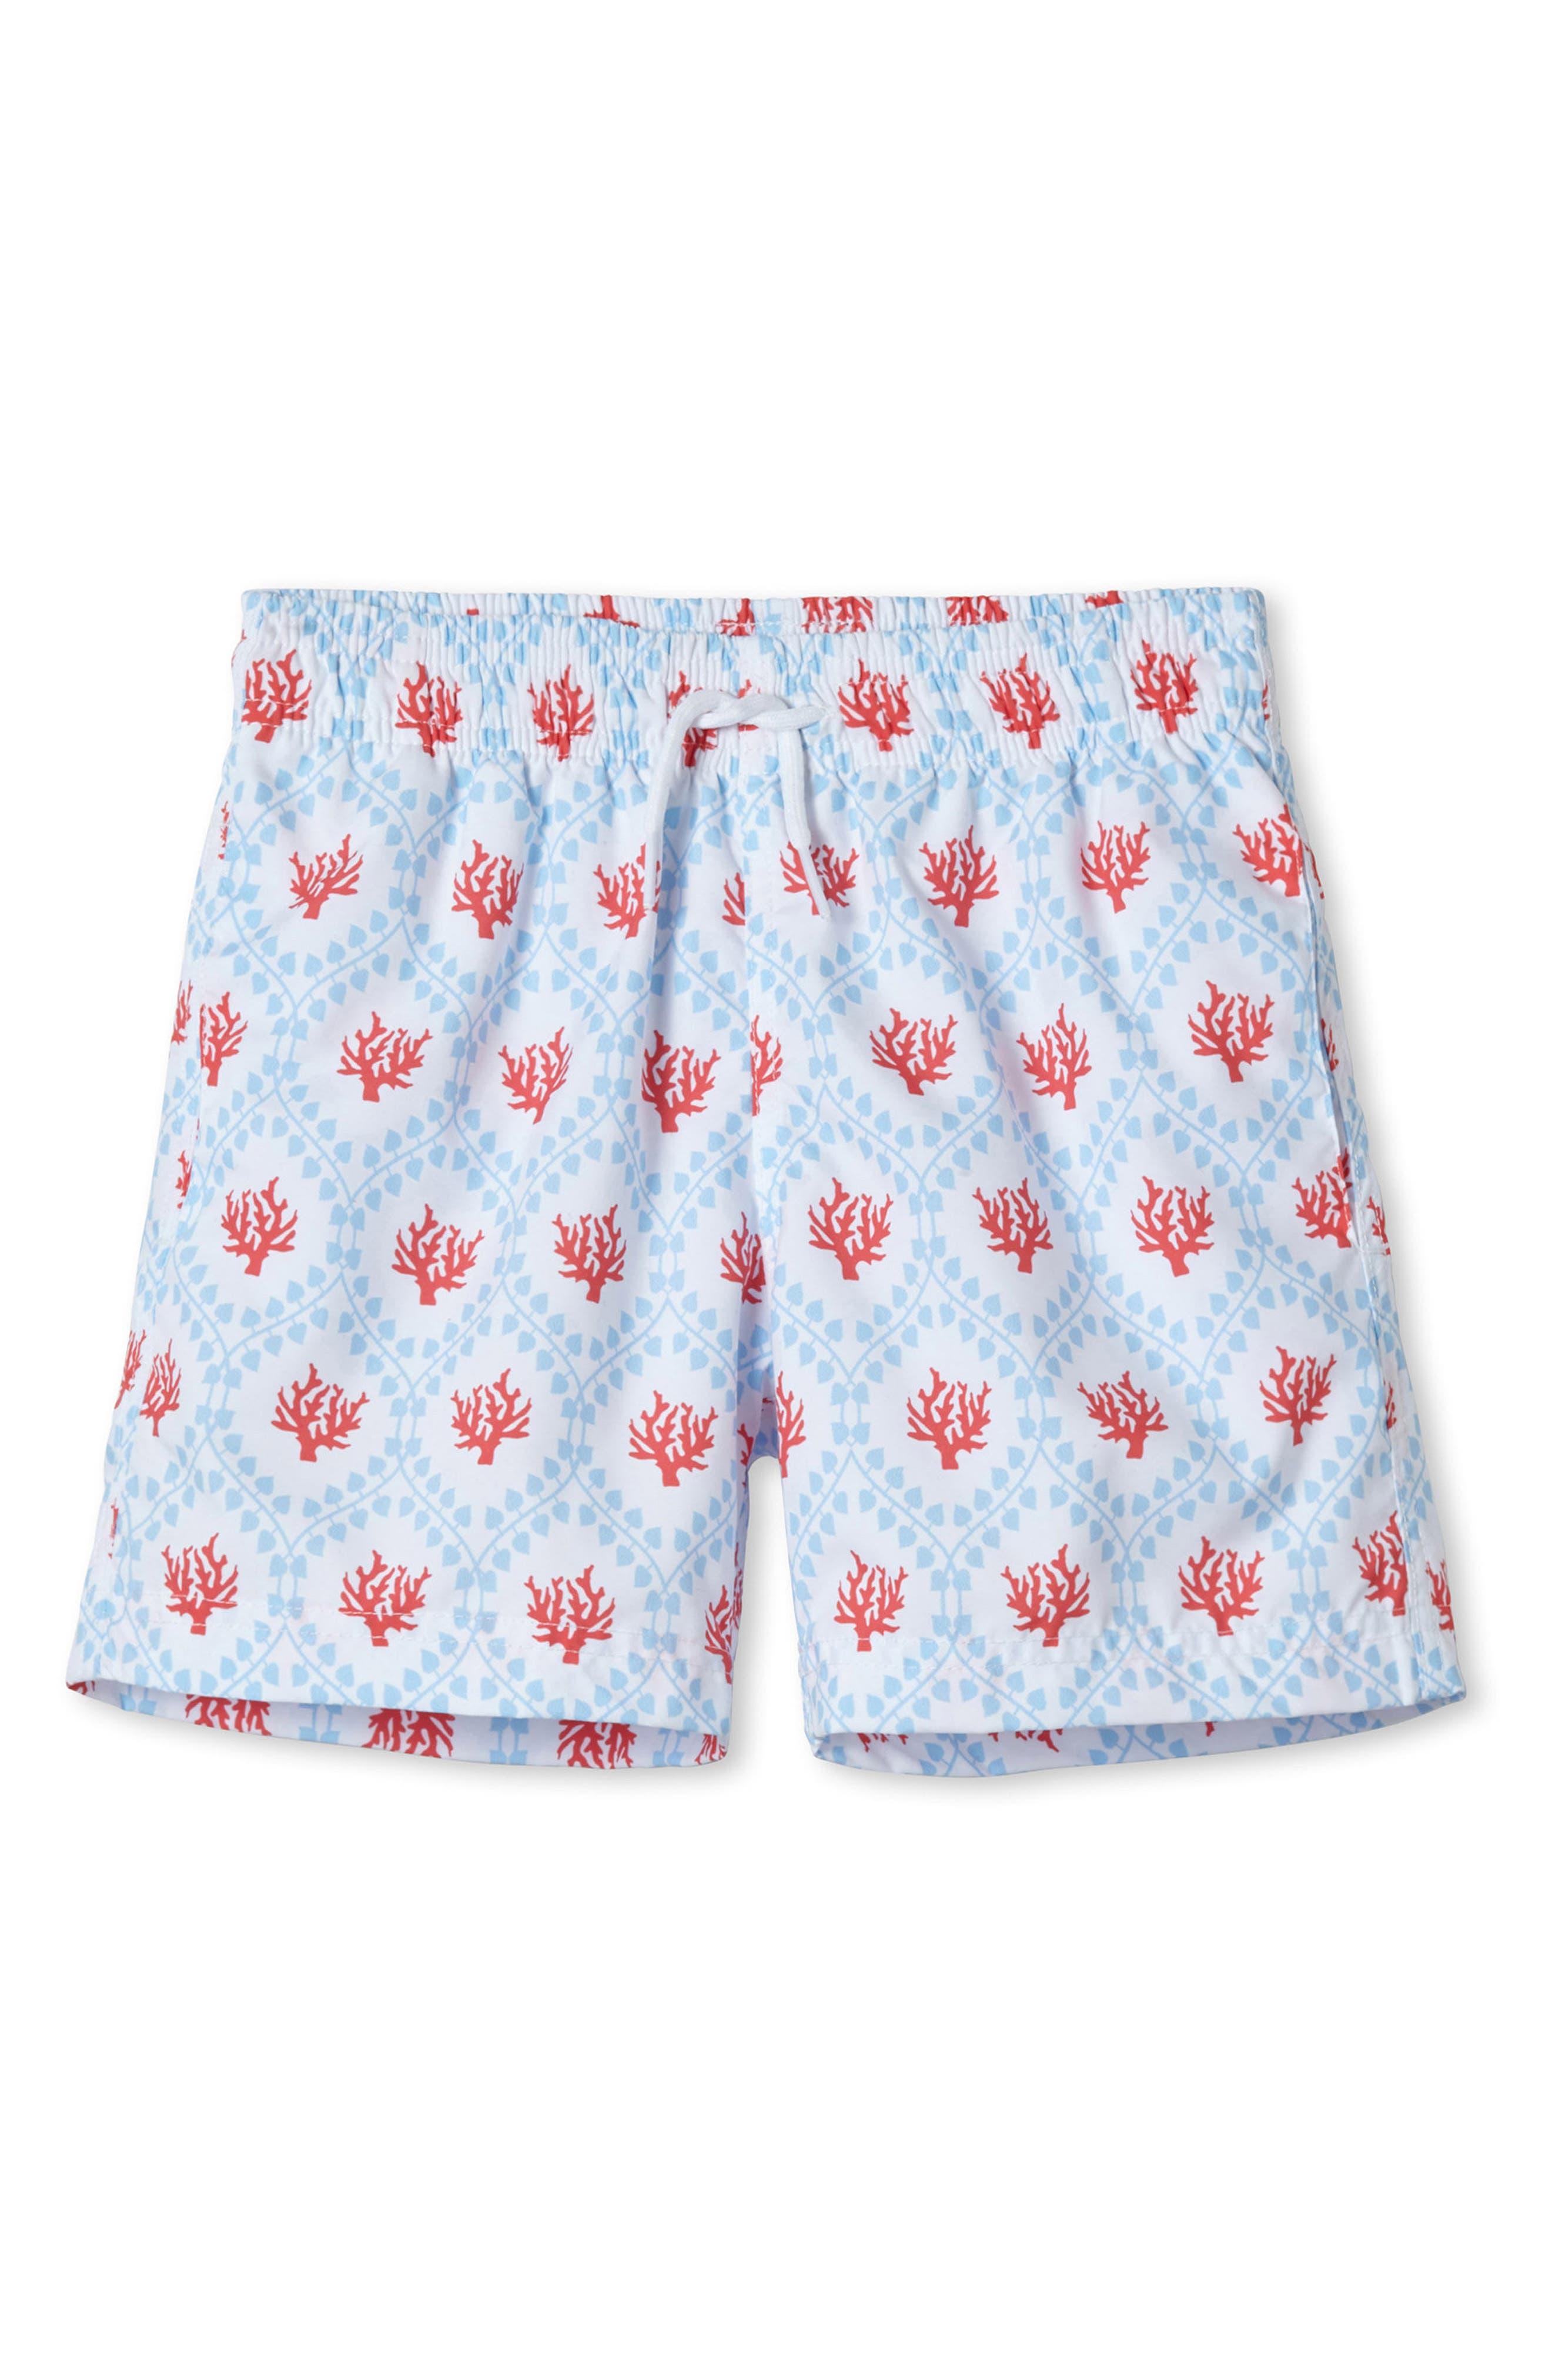 Stella Cove Red Coral Swim Trunks (Toddler Boys & Little Boys)